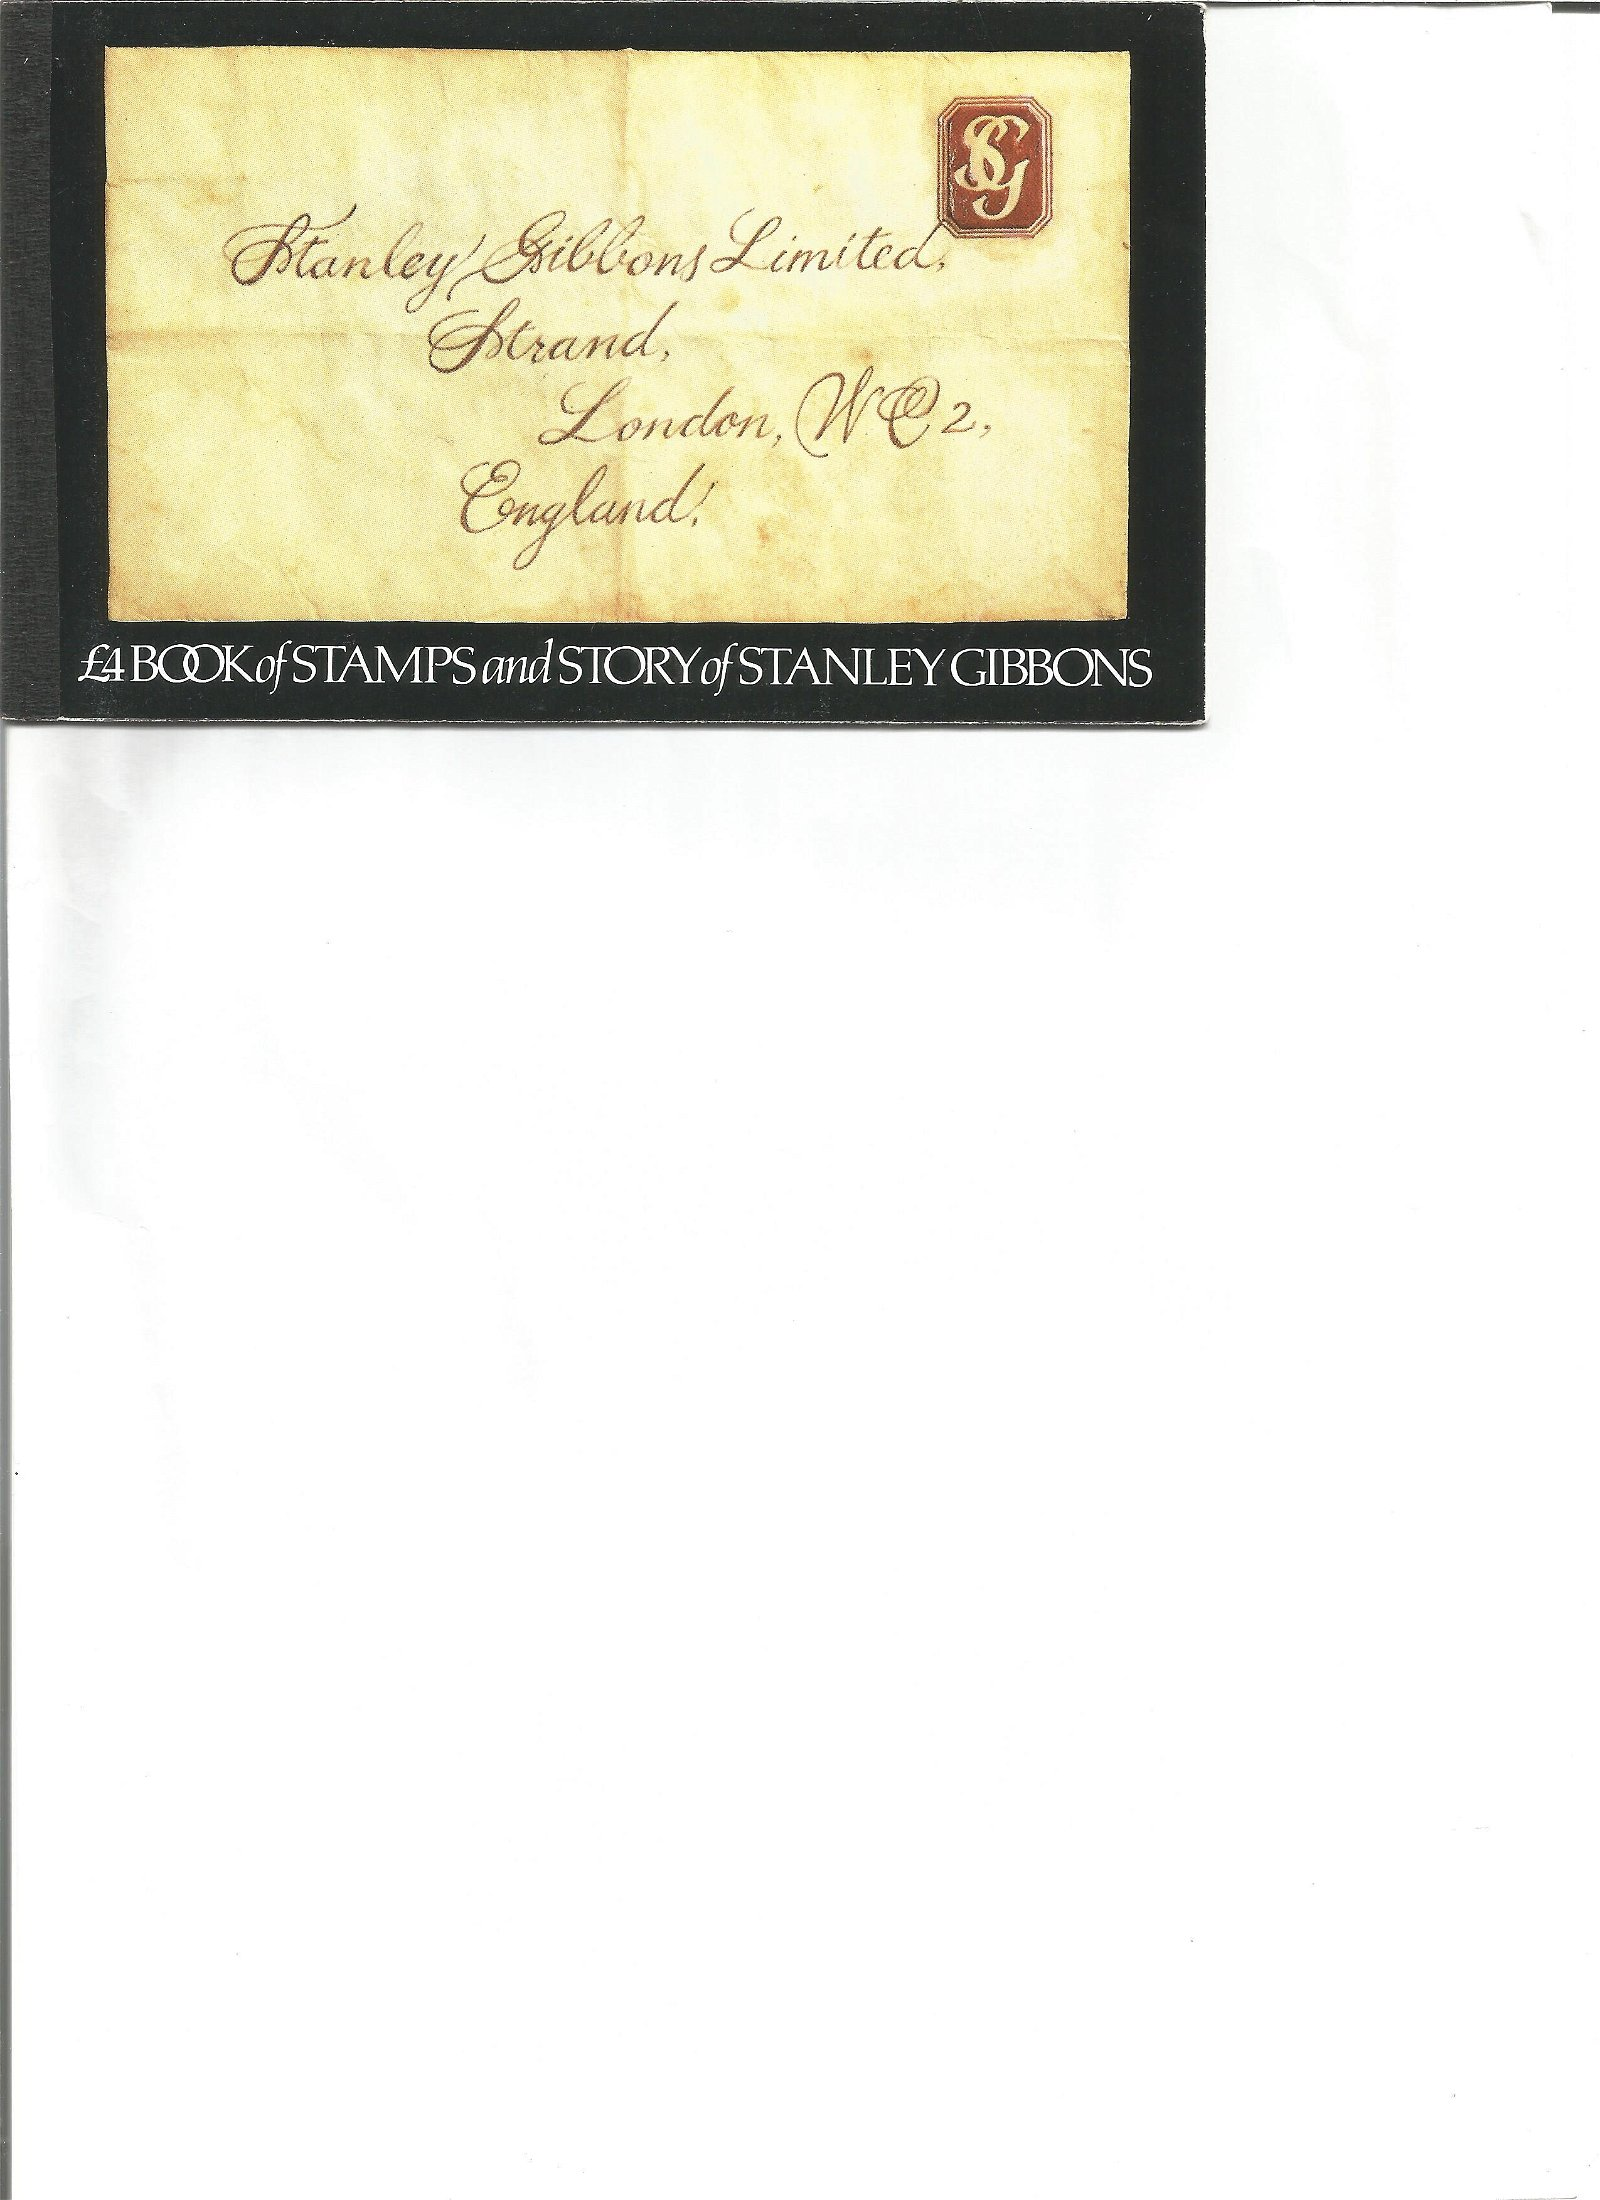 Royal Mail complete prestige stamp booklet Story of